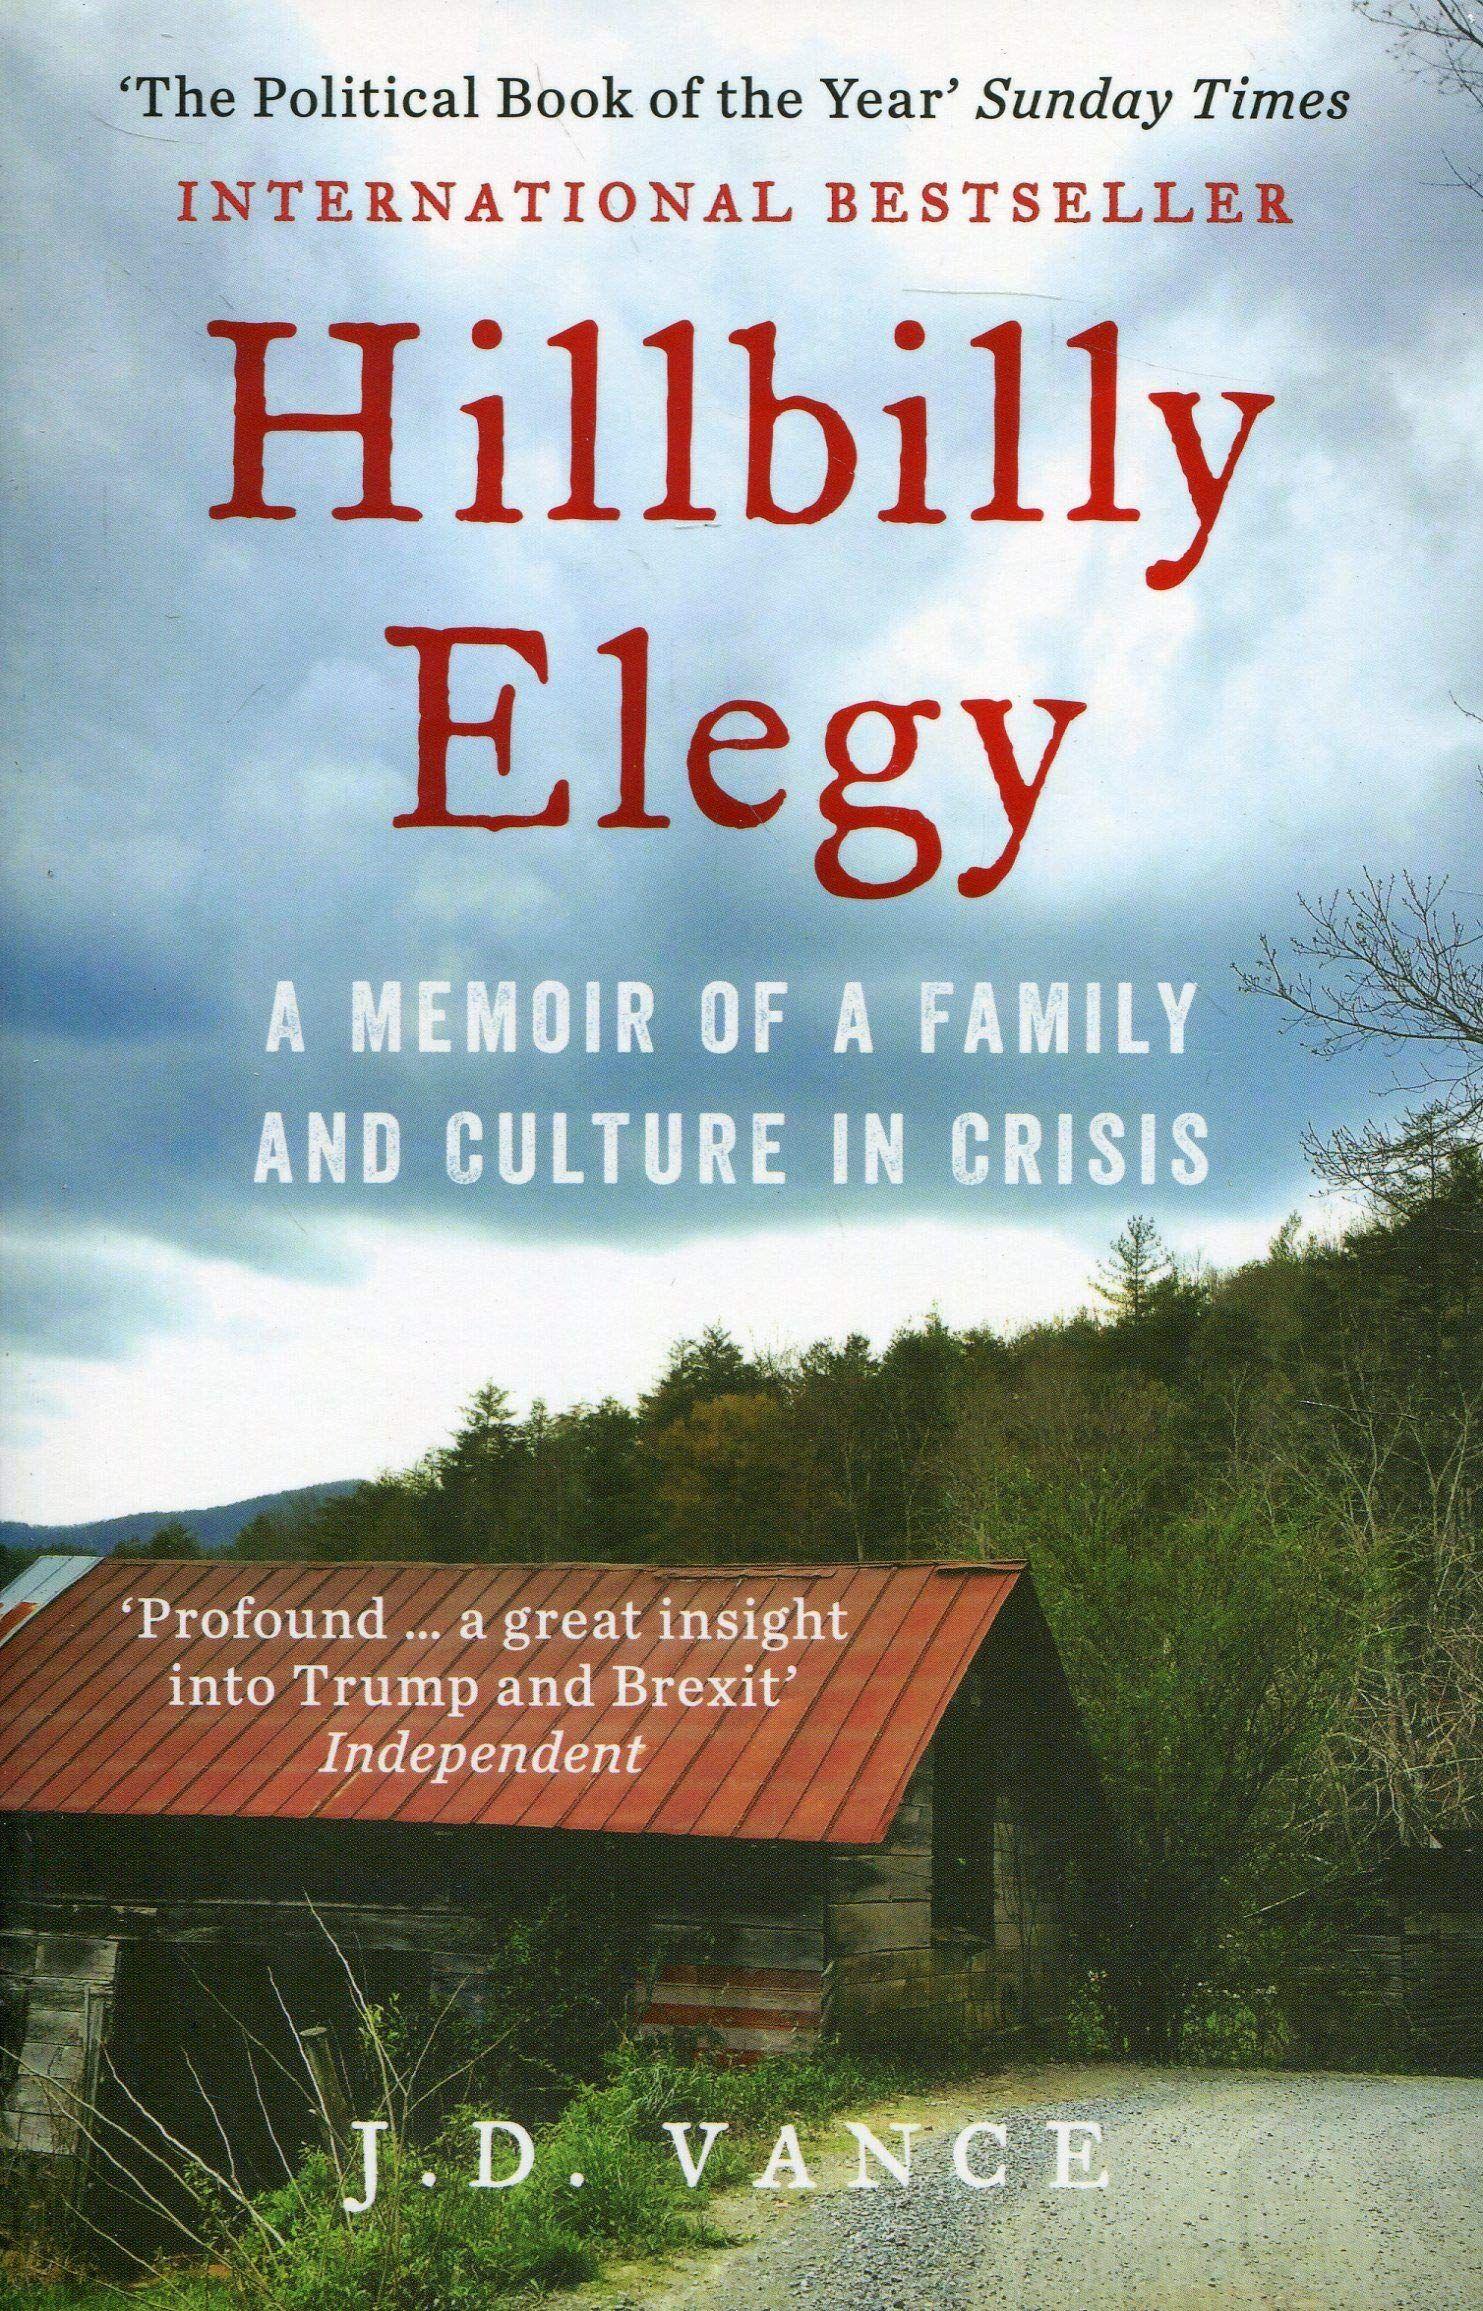 Hillbilly Elegy Book By J D Vance Online Reading Summary Review Book Download Pdf Https Www Toevolution Com File View 203022 Hillbil En 2020 Beis Gandi